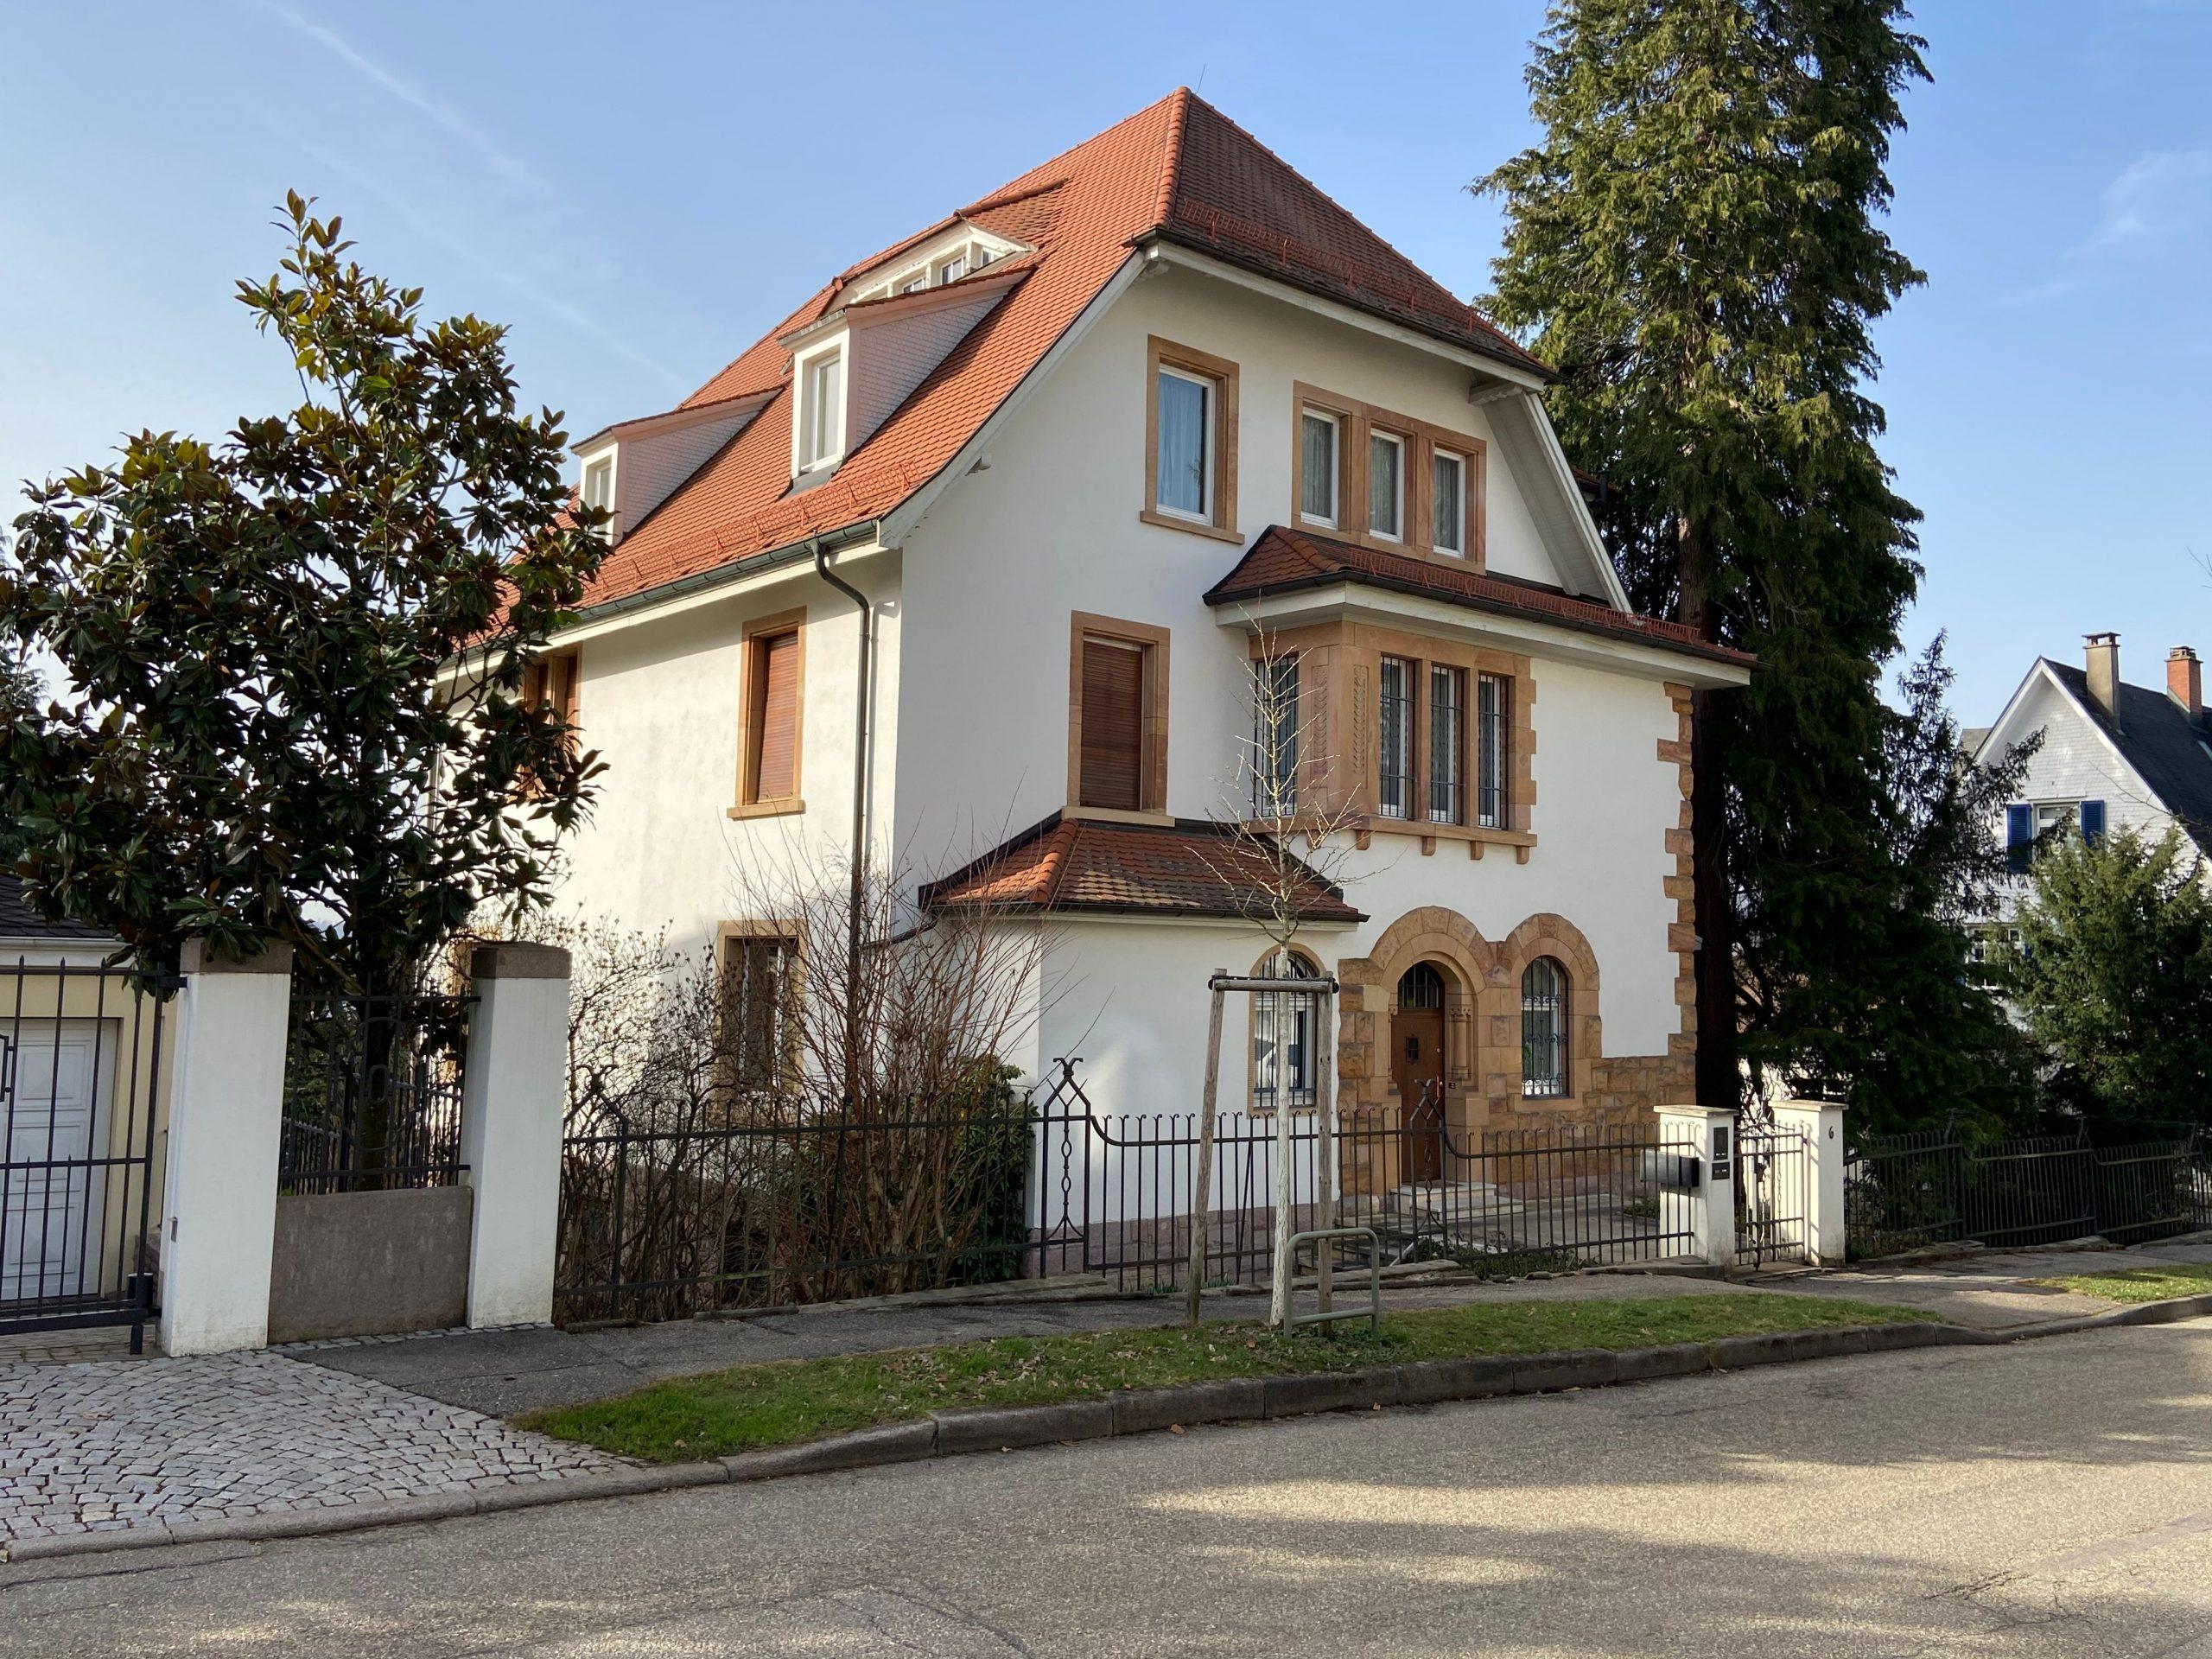 Top Lage – Prinz-Weimar-Straße